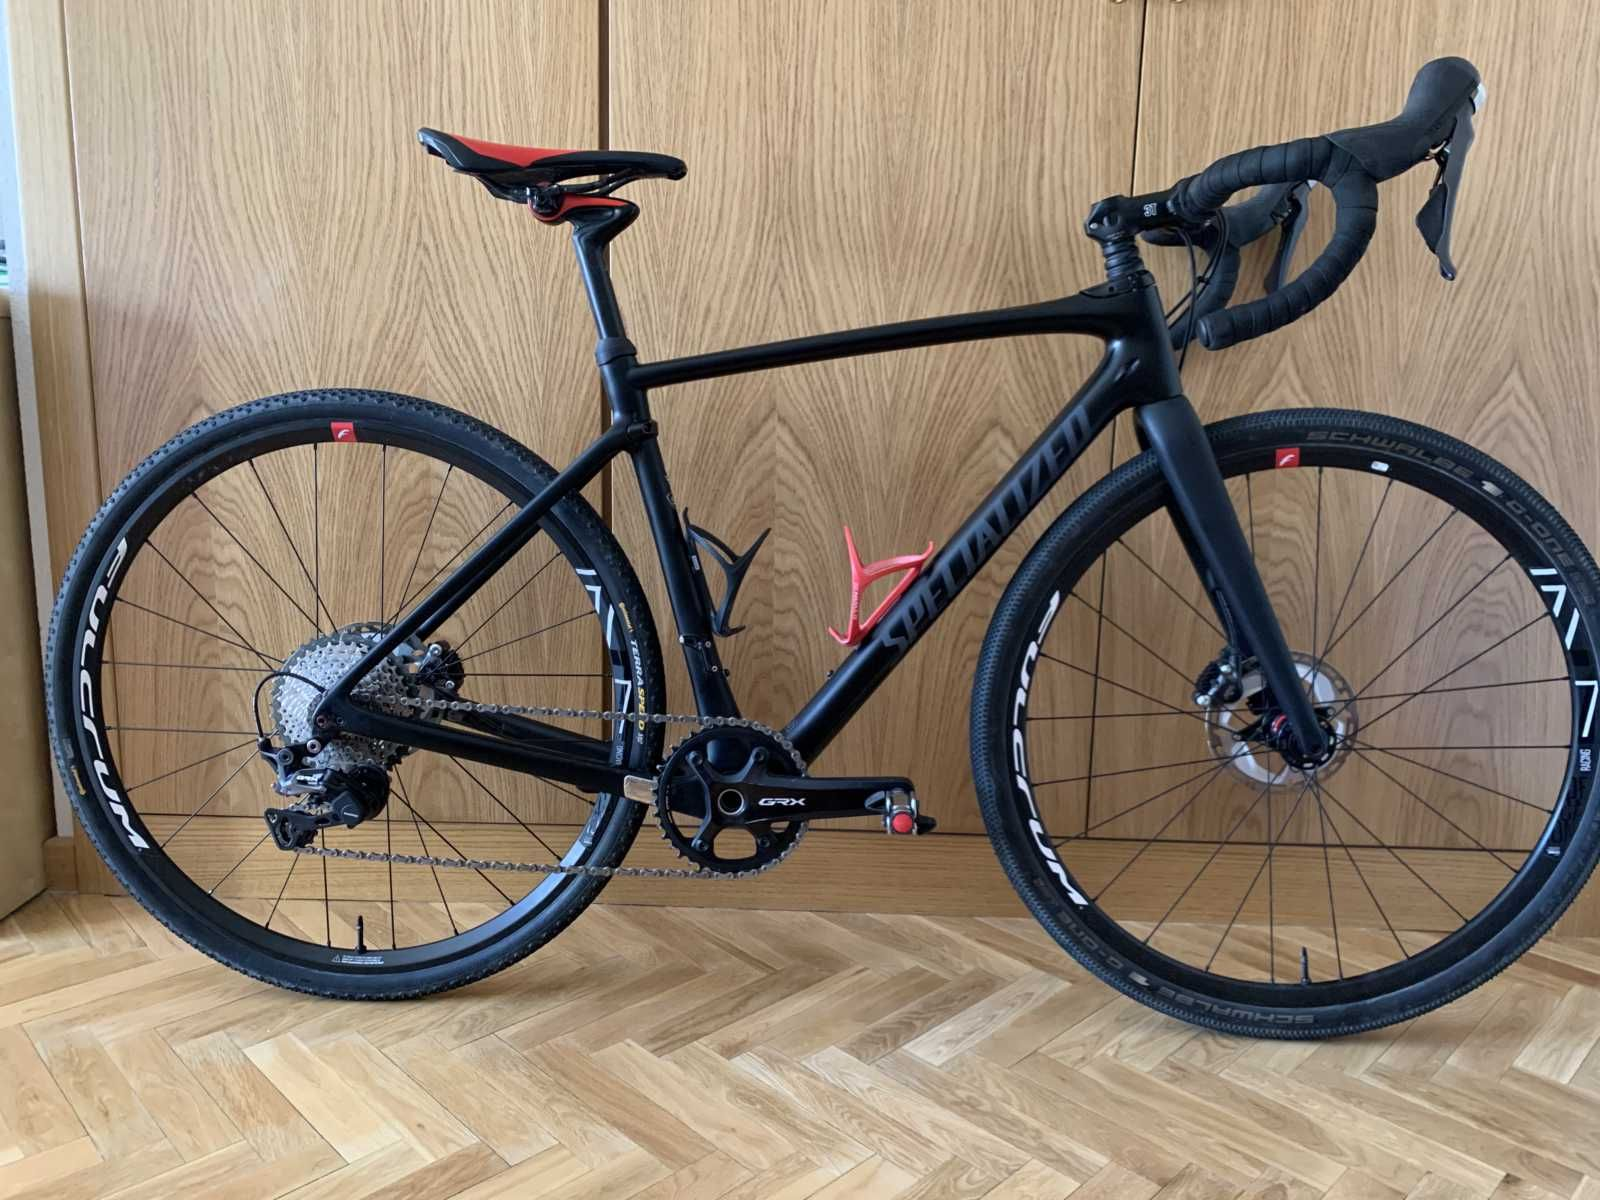 Bicicleta Specialized Roubaix en talla 52 58190